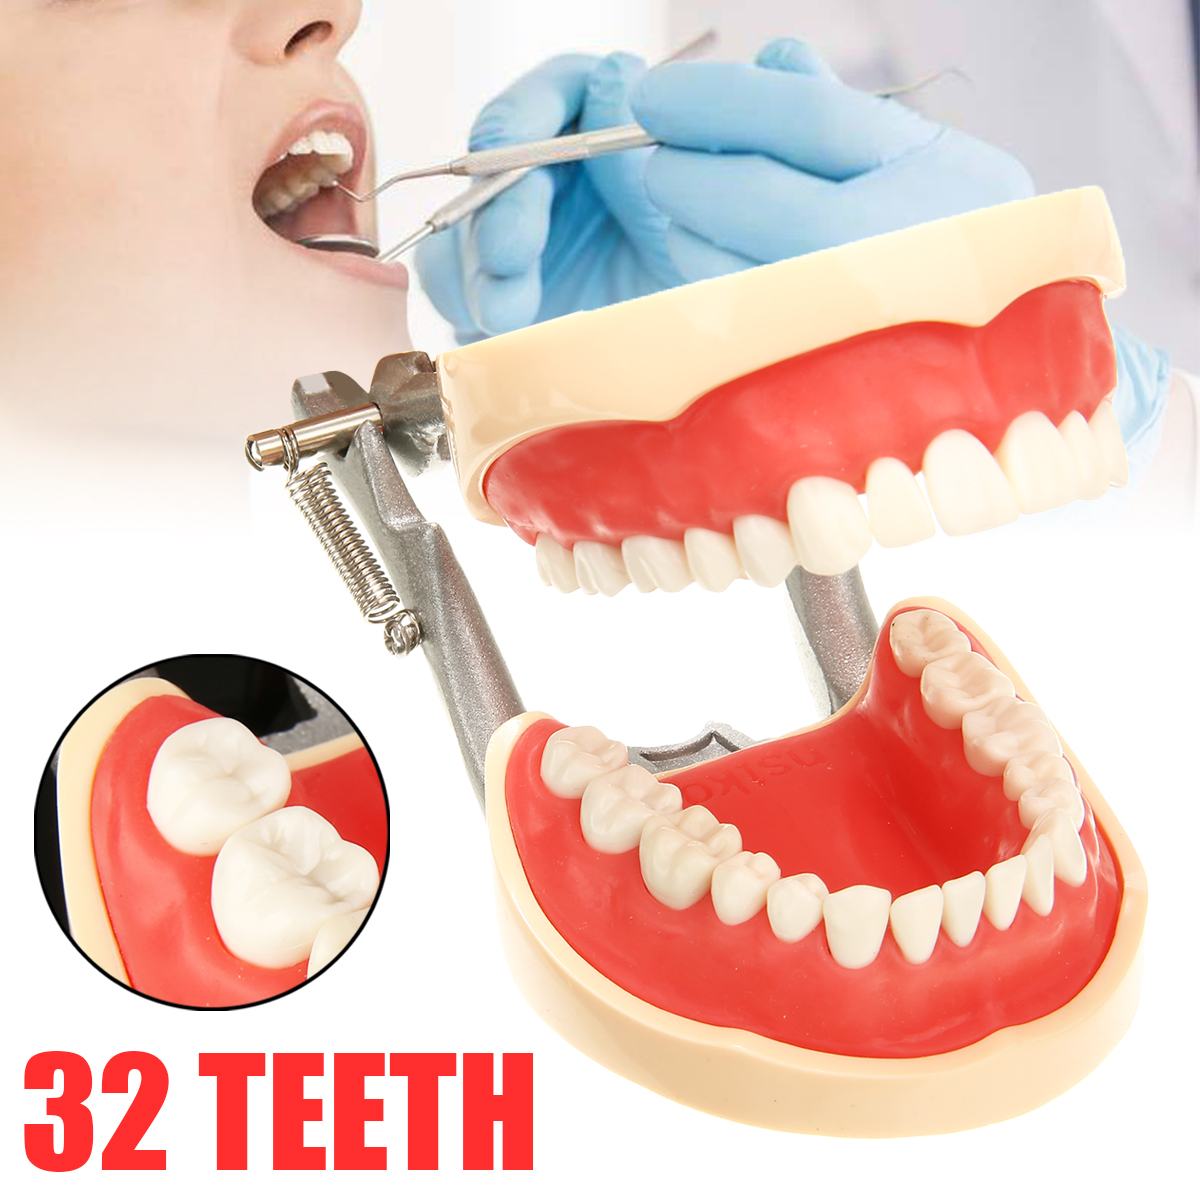 1 Set  screw-in Removable Teeth Dental Teaching Study Model Dental Typodont Model for Oral Medical Education1 Set  screw-in Removable Teeth Dental Teaching Study Model Dental Typodont Model for Oral Medical Education